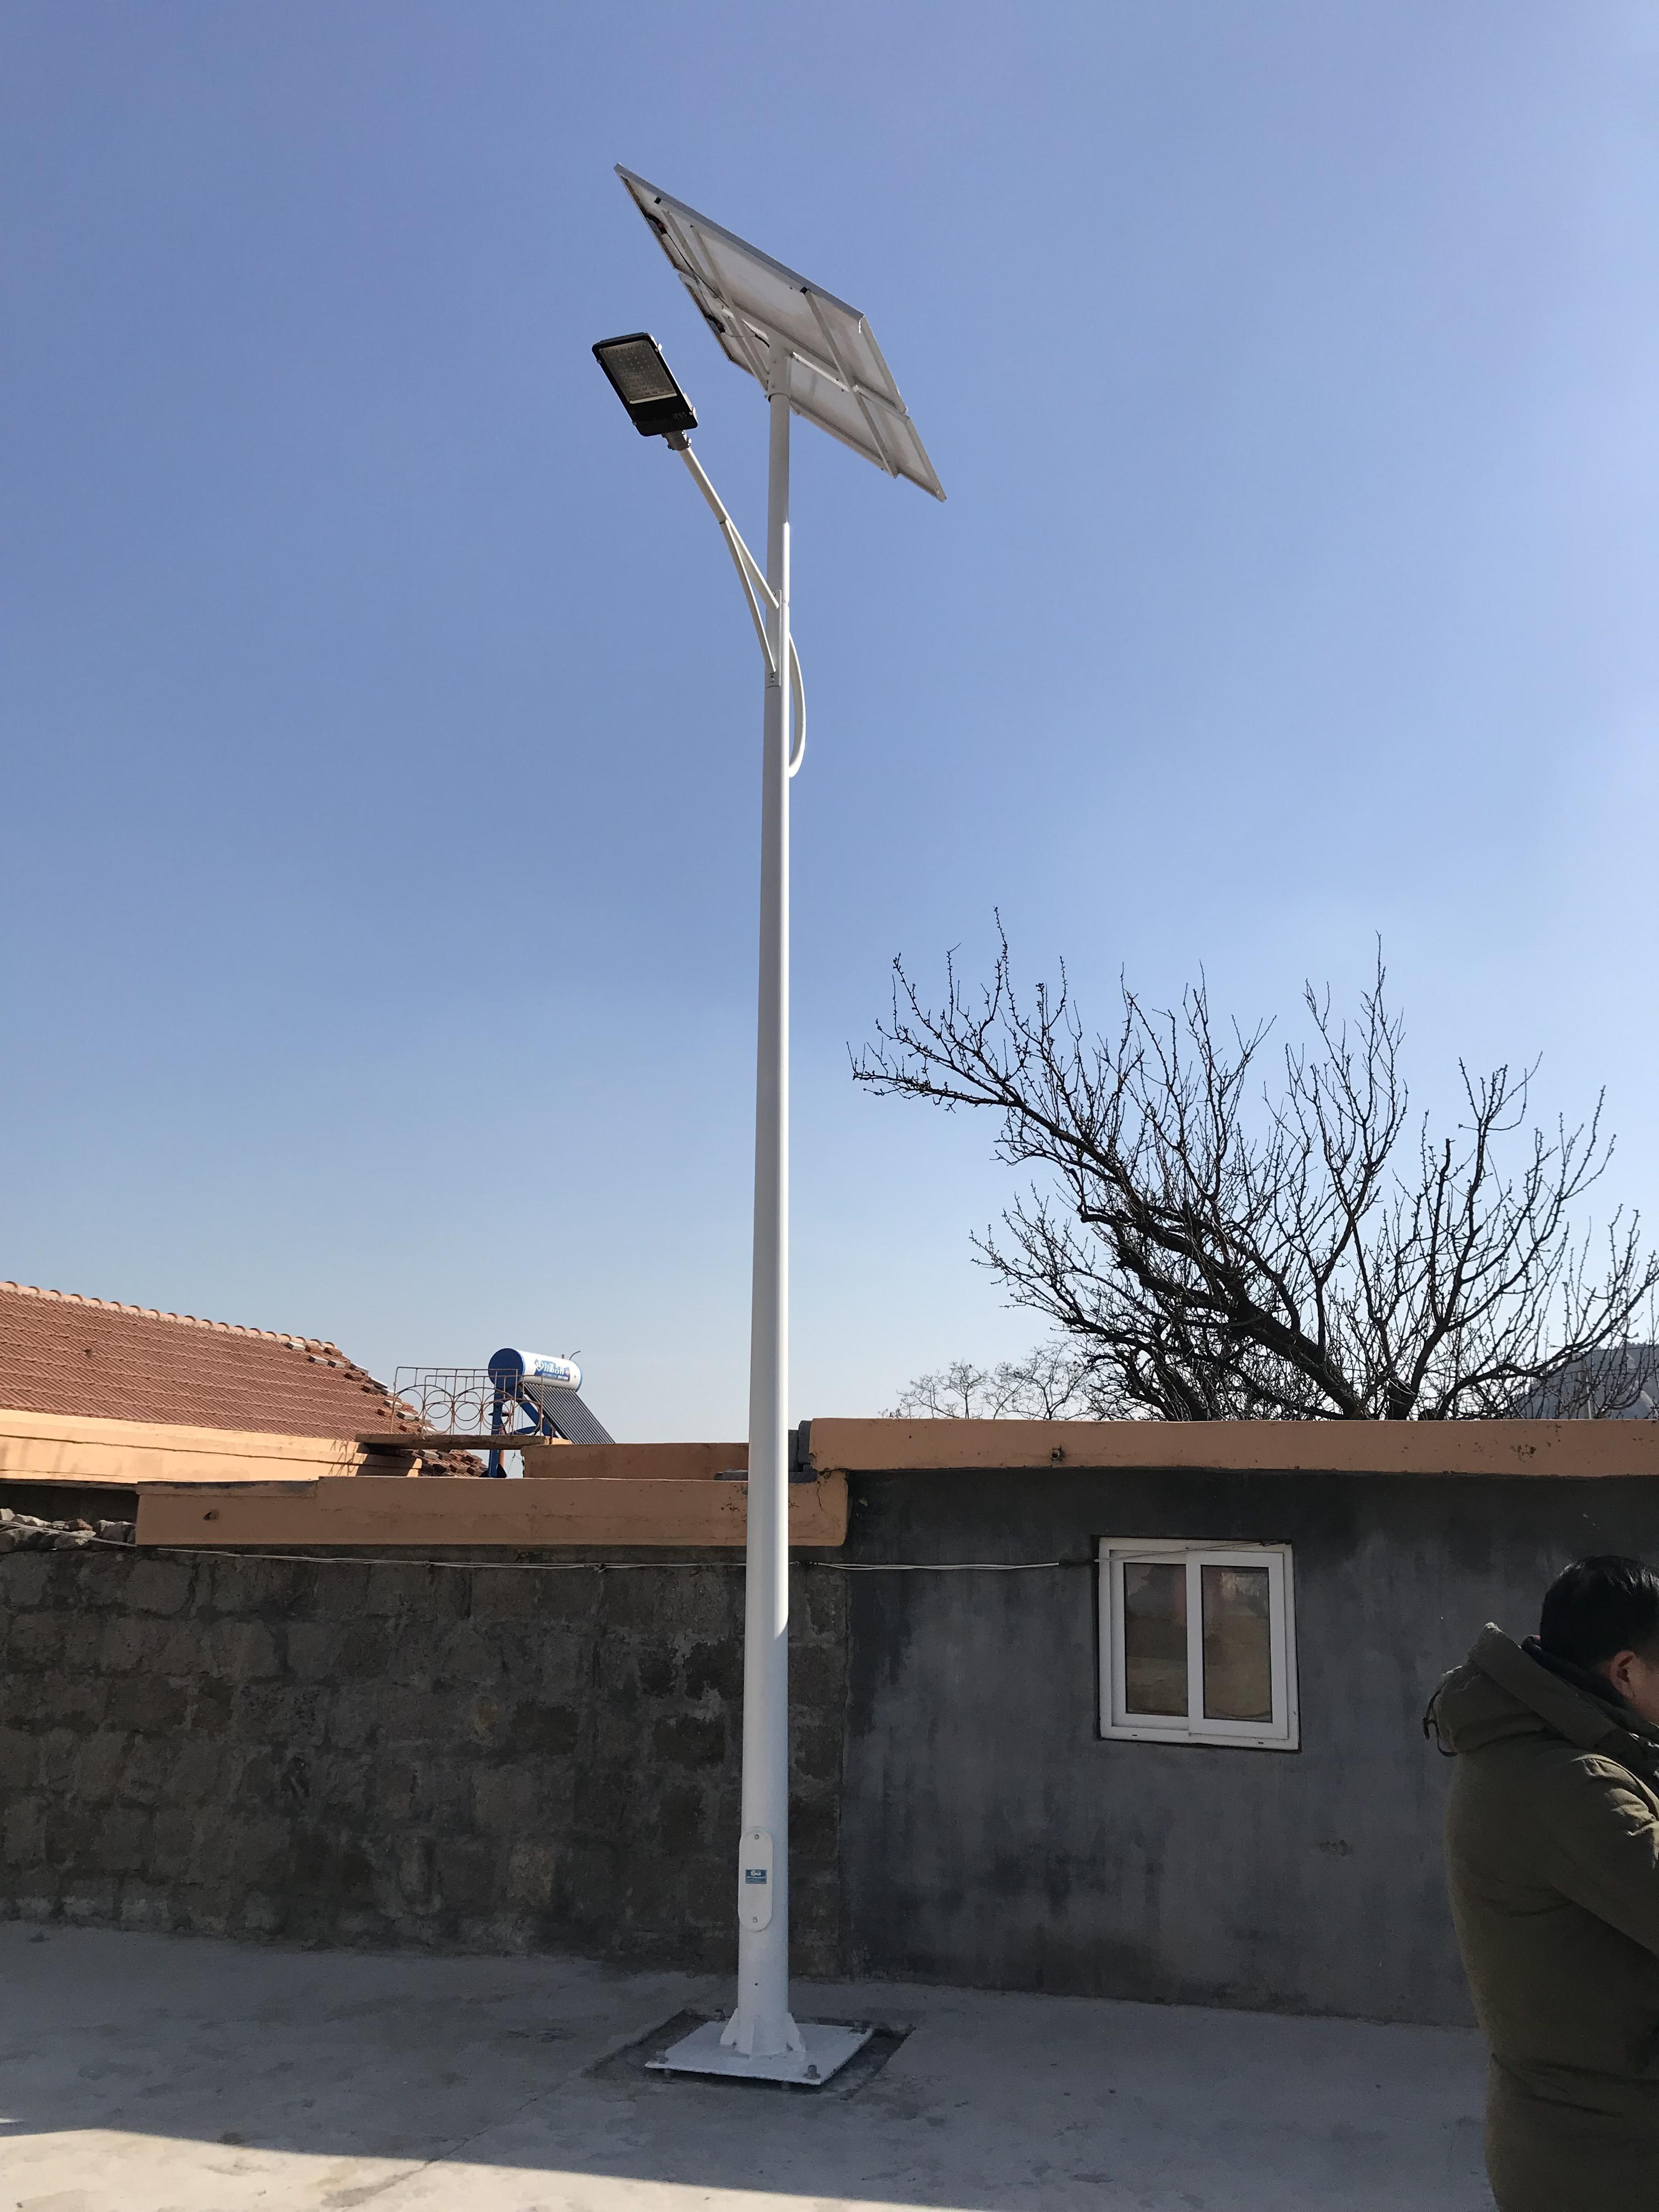 ballbet体育下载王哥庄街道西山社区太阳能路灯项目